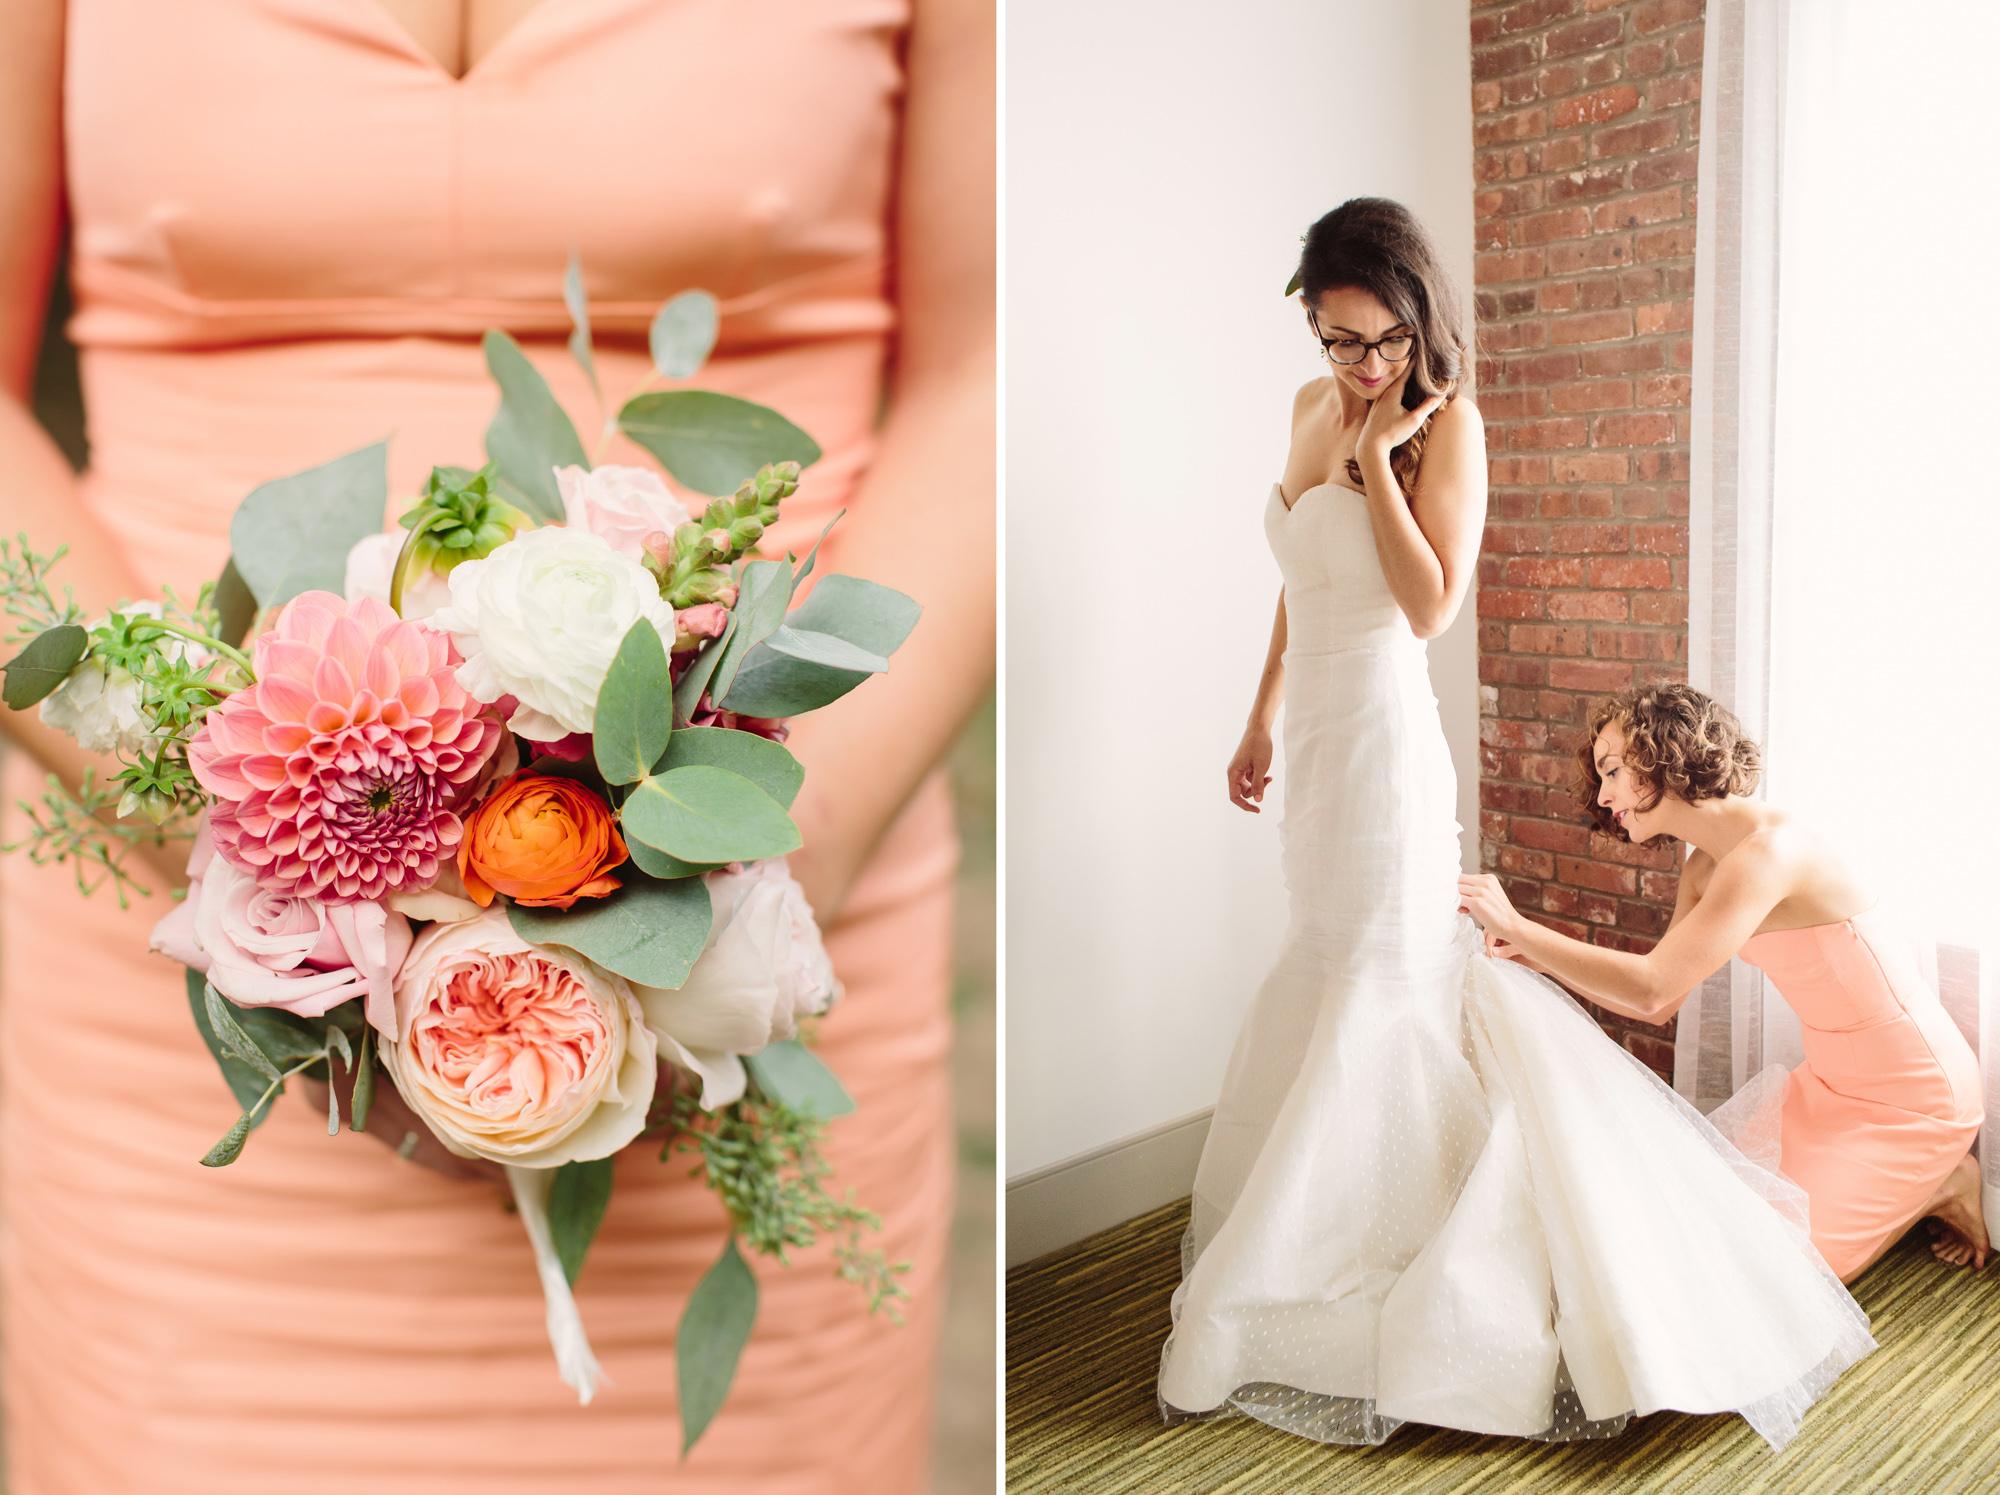 08a_Kate_Sam_Picnic_House_Wedding_Brooklyn_NY_Tanya_Salazar_Photography.jpg